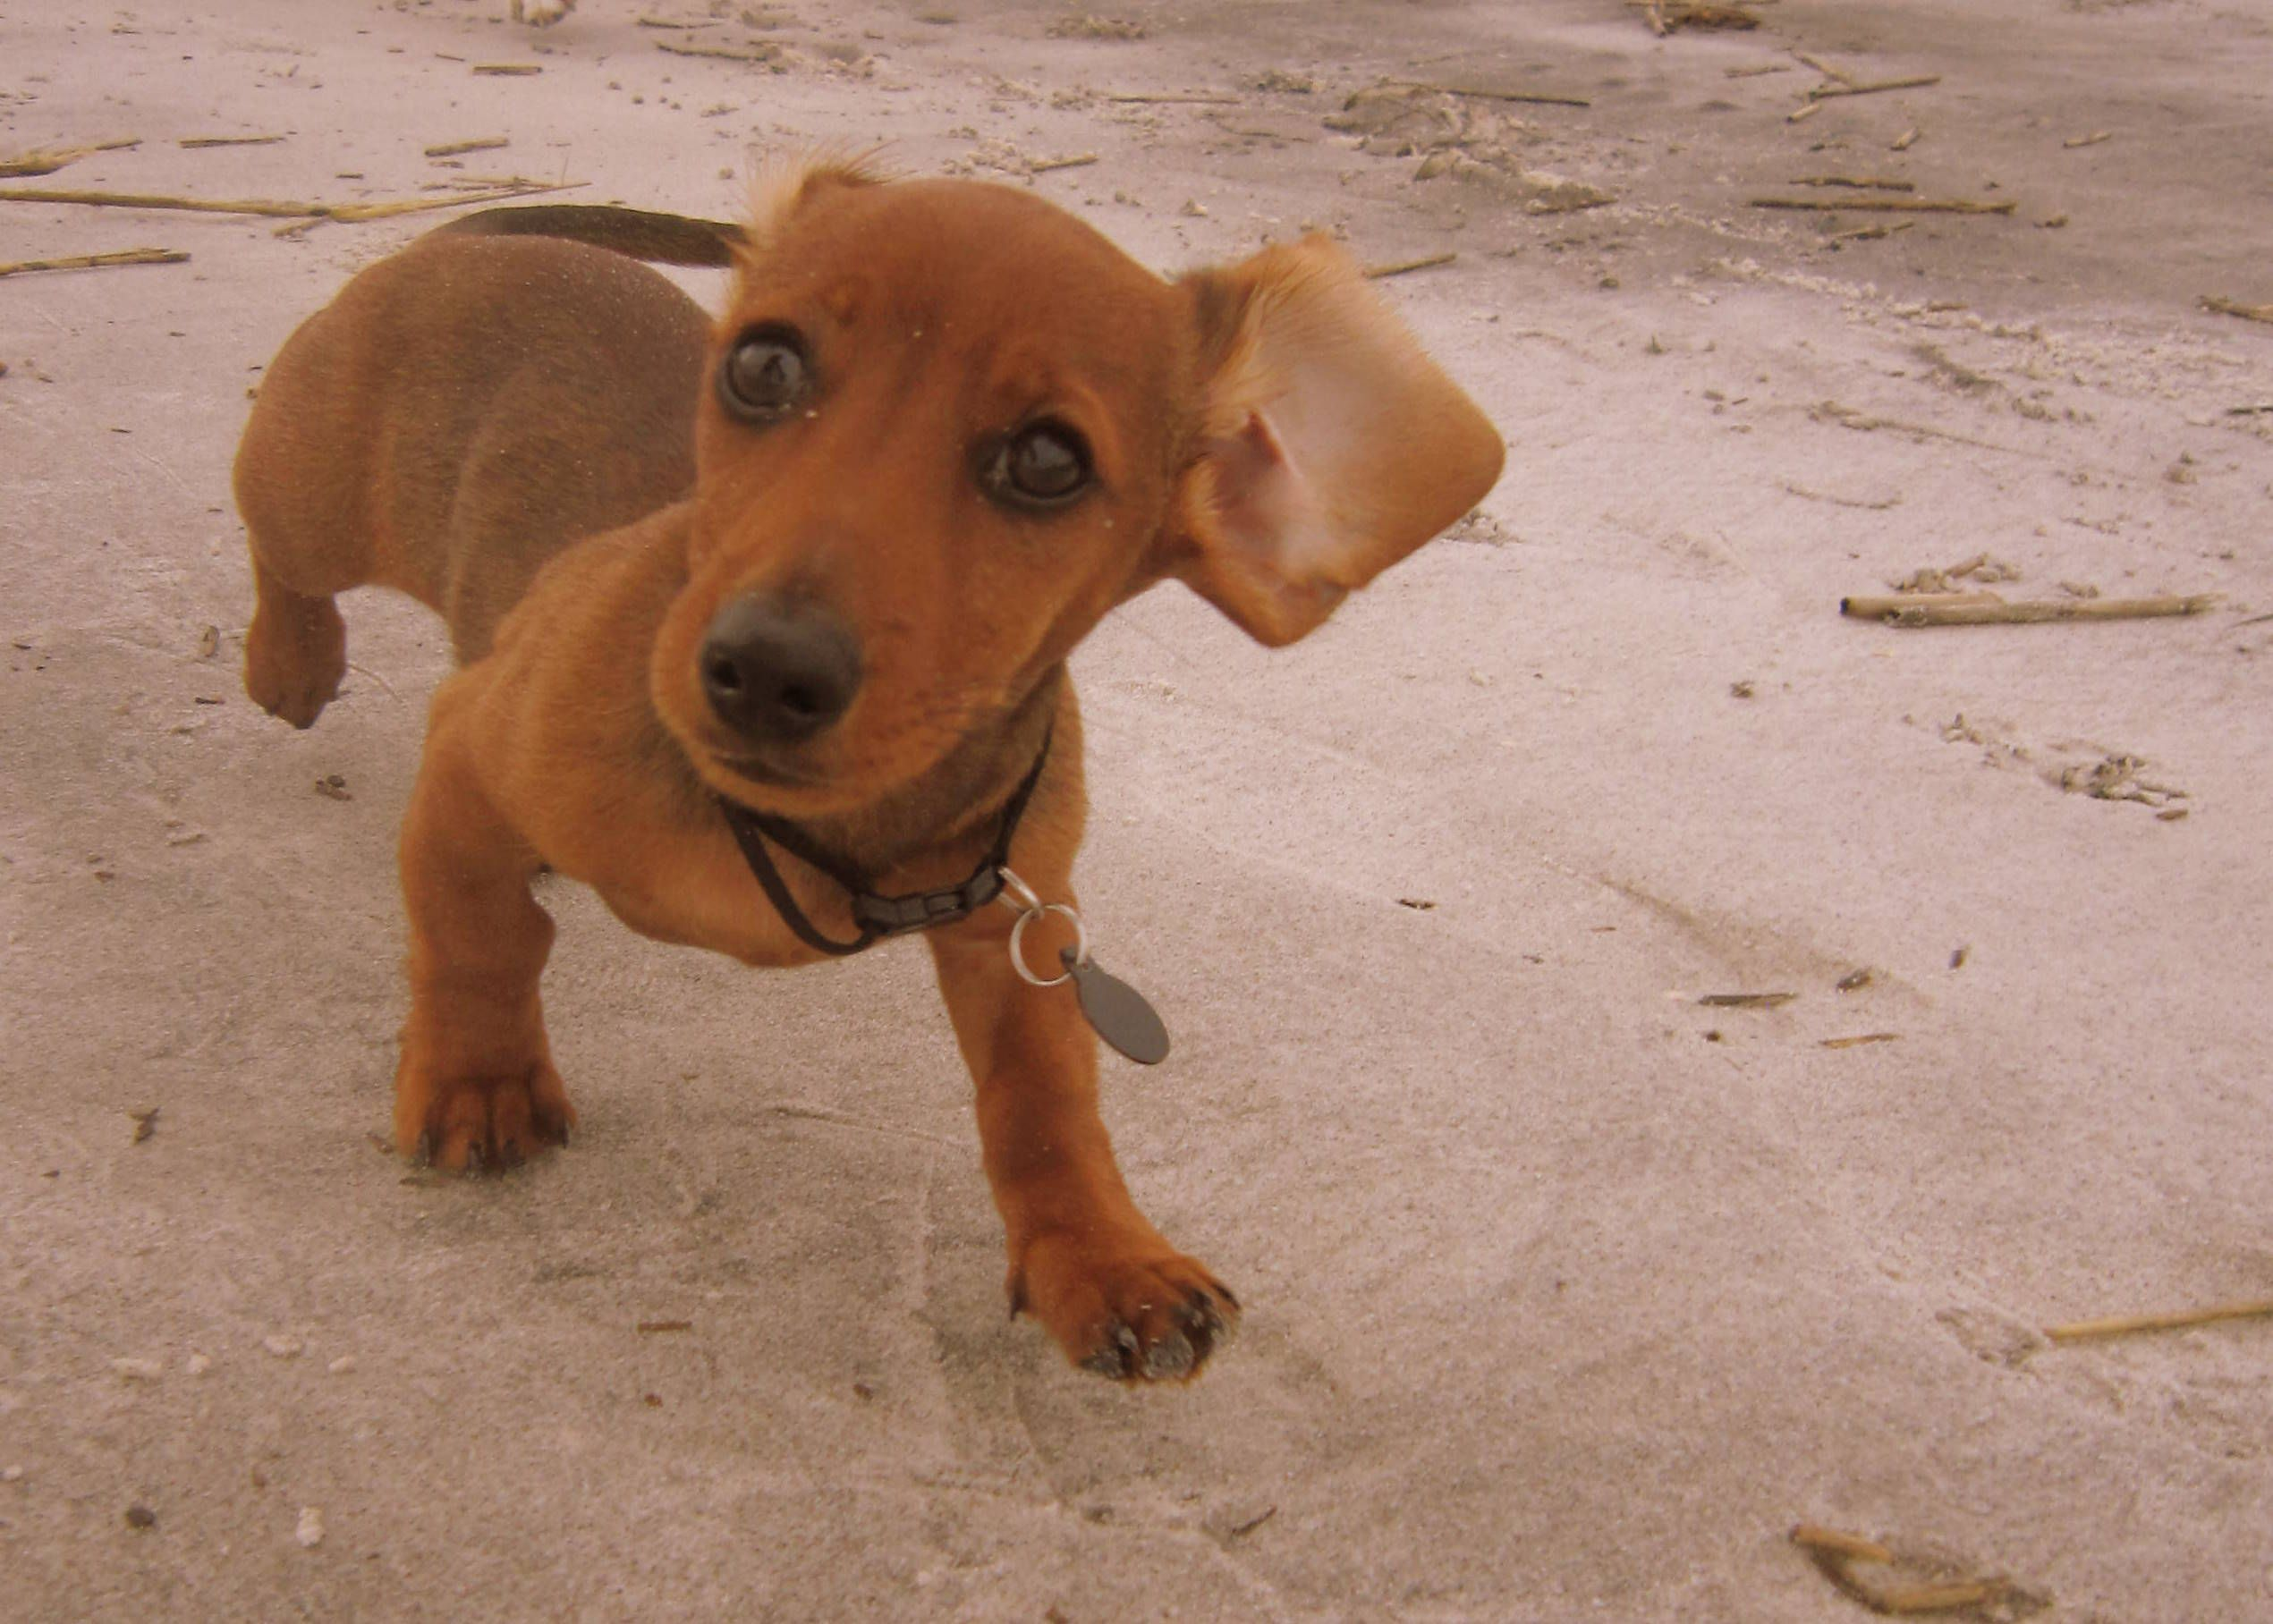 Dachshund puppy on the beach! Cute animal photos